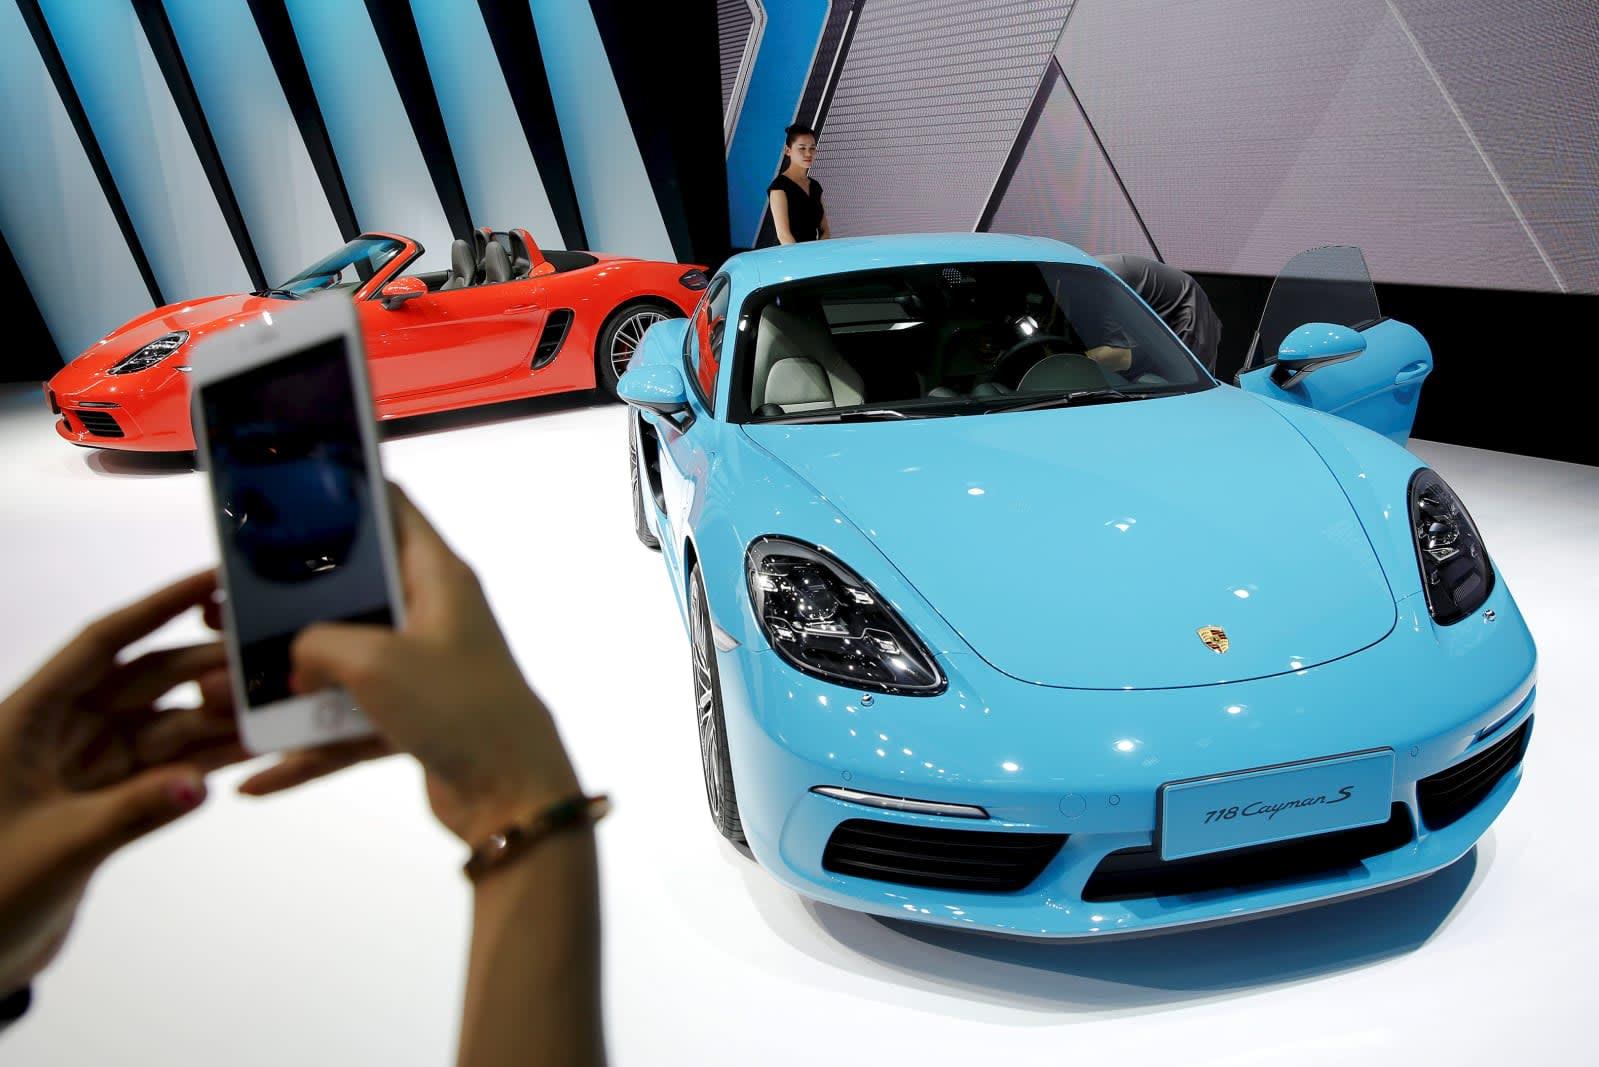 Porsche's $2,000 Passport subscription swaps cars on demand